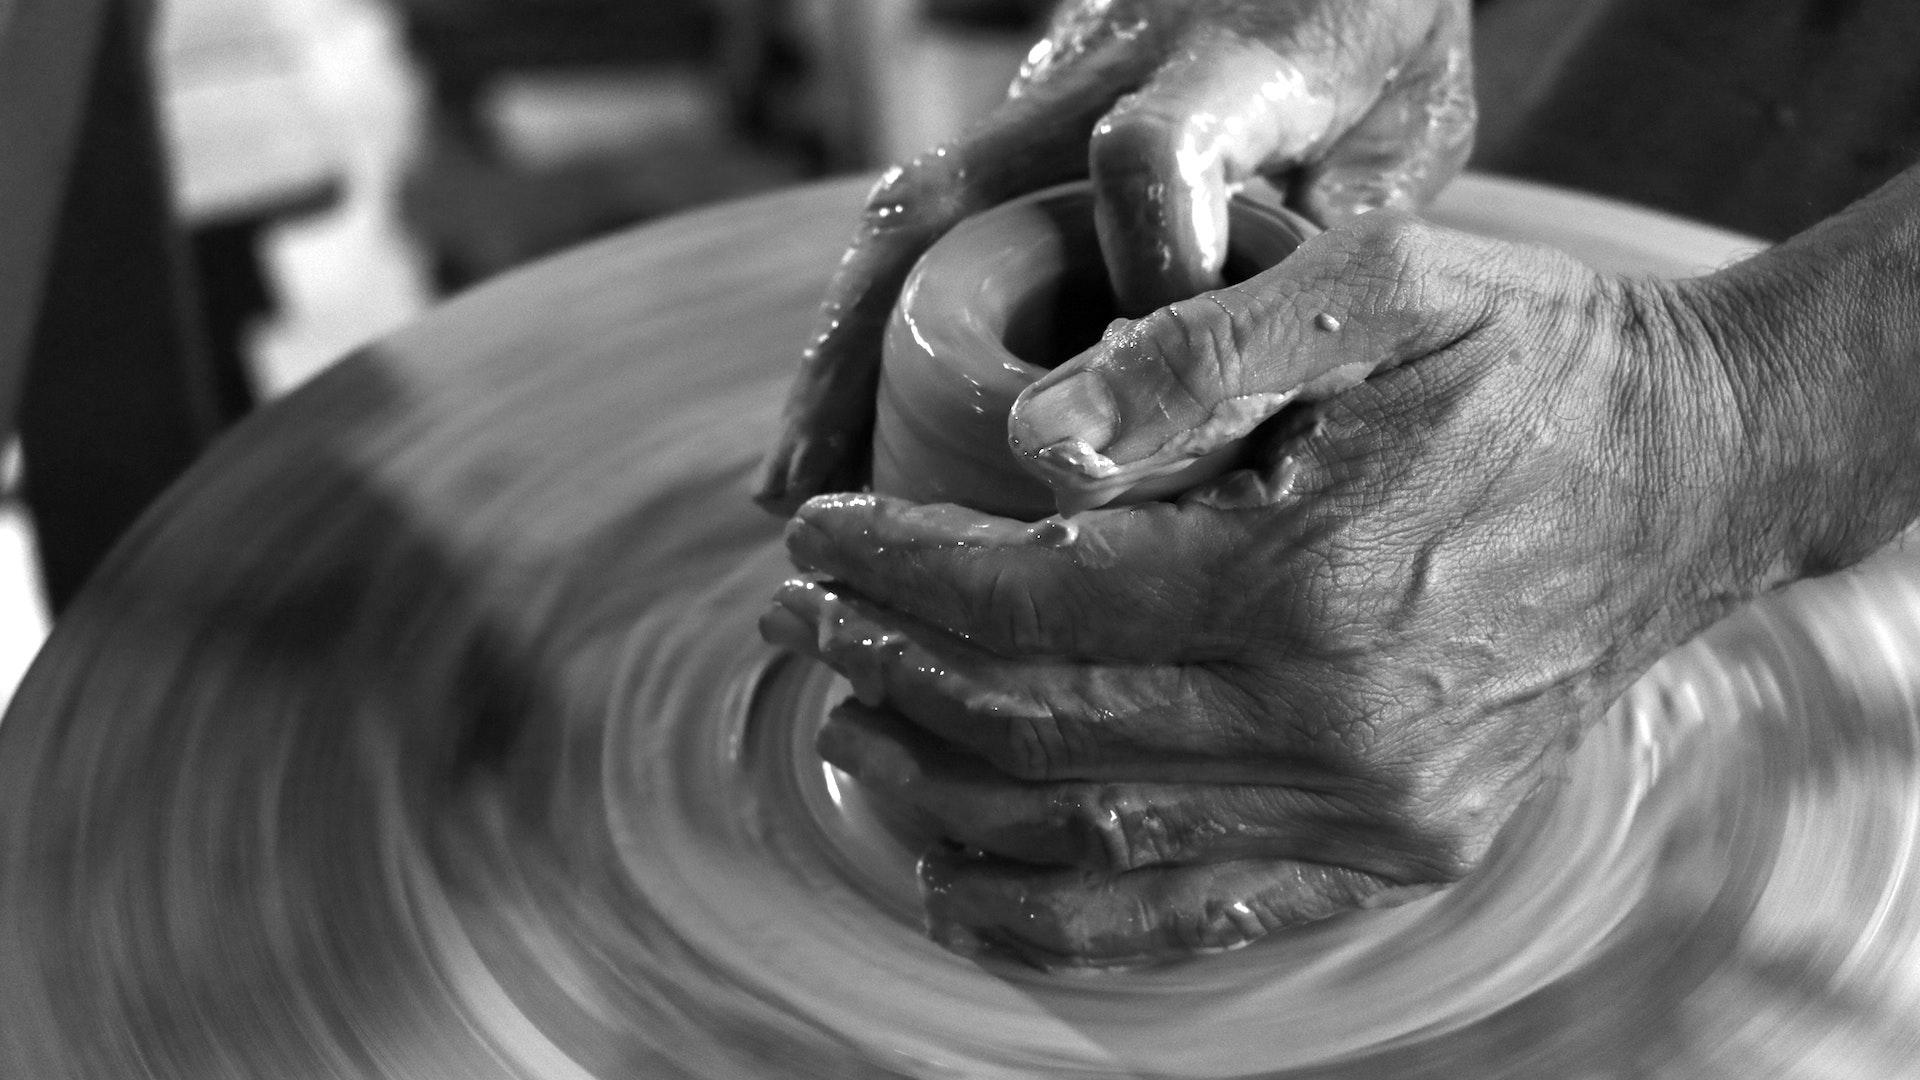 How Creators Create: A Plastic Surgeon's Love of Pottery